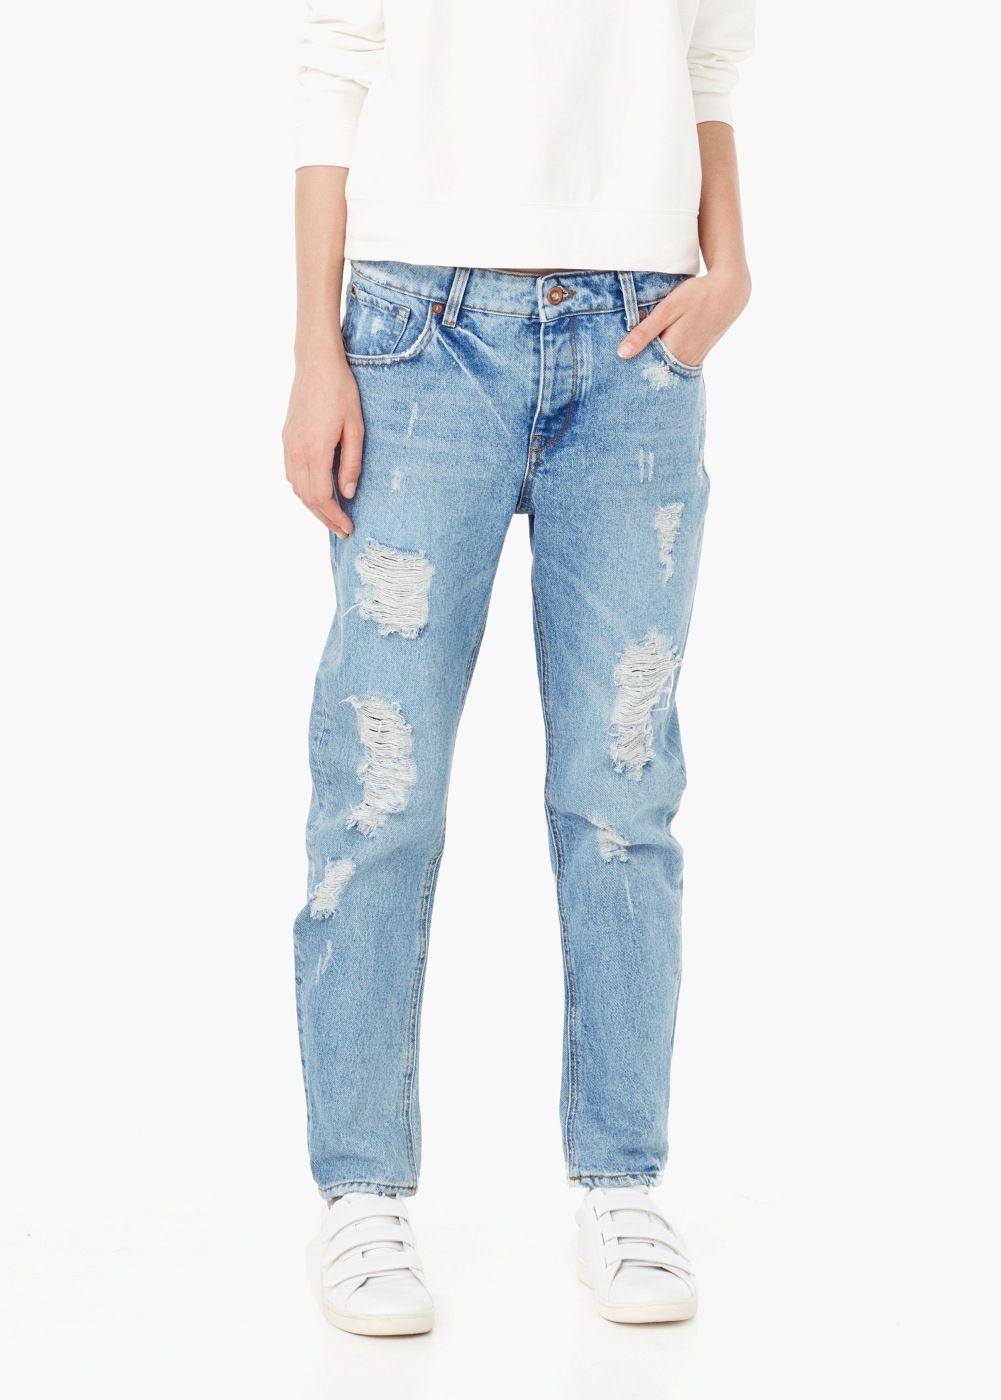 b409a32aa23f7 Jean boyfriend angie - Femme   vêtements   Pinterest   Jeans, Jeans ...